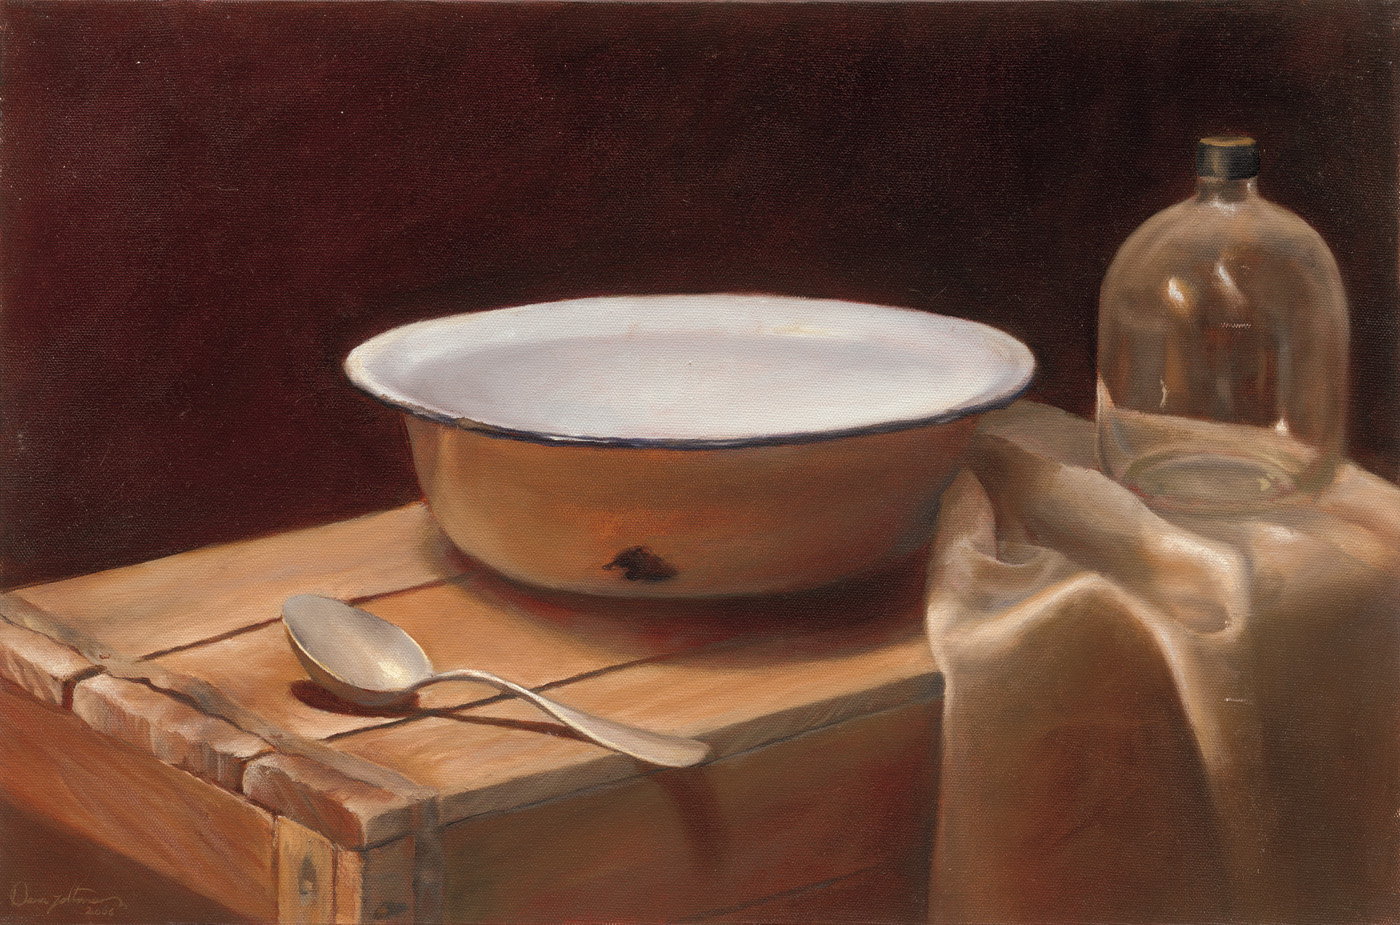 Bowl on a box